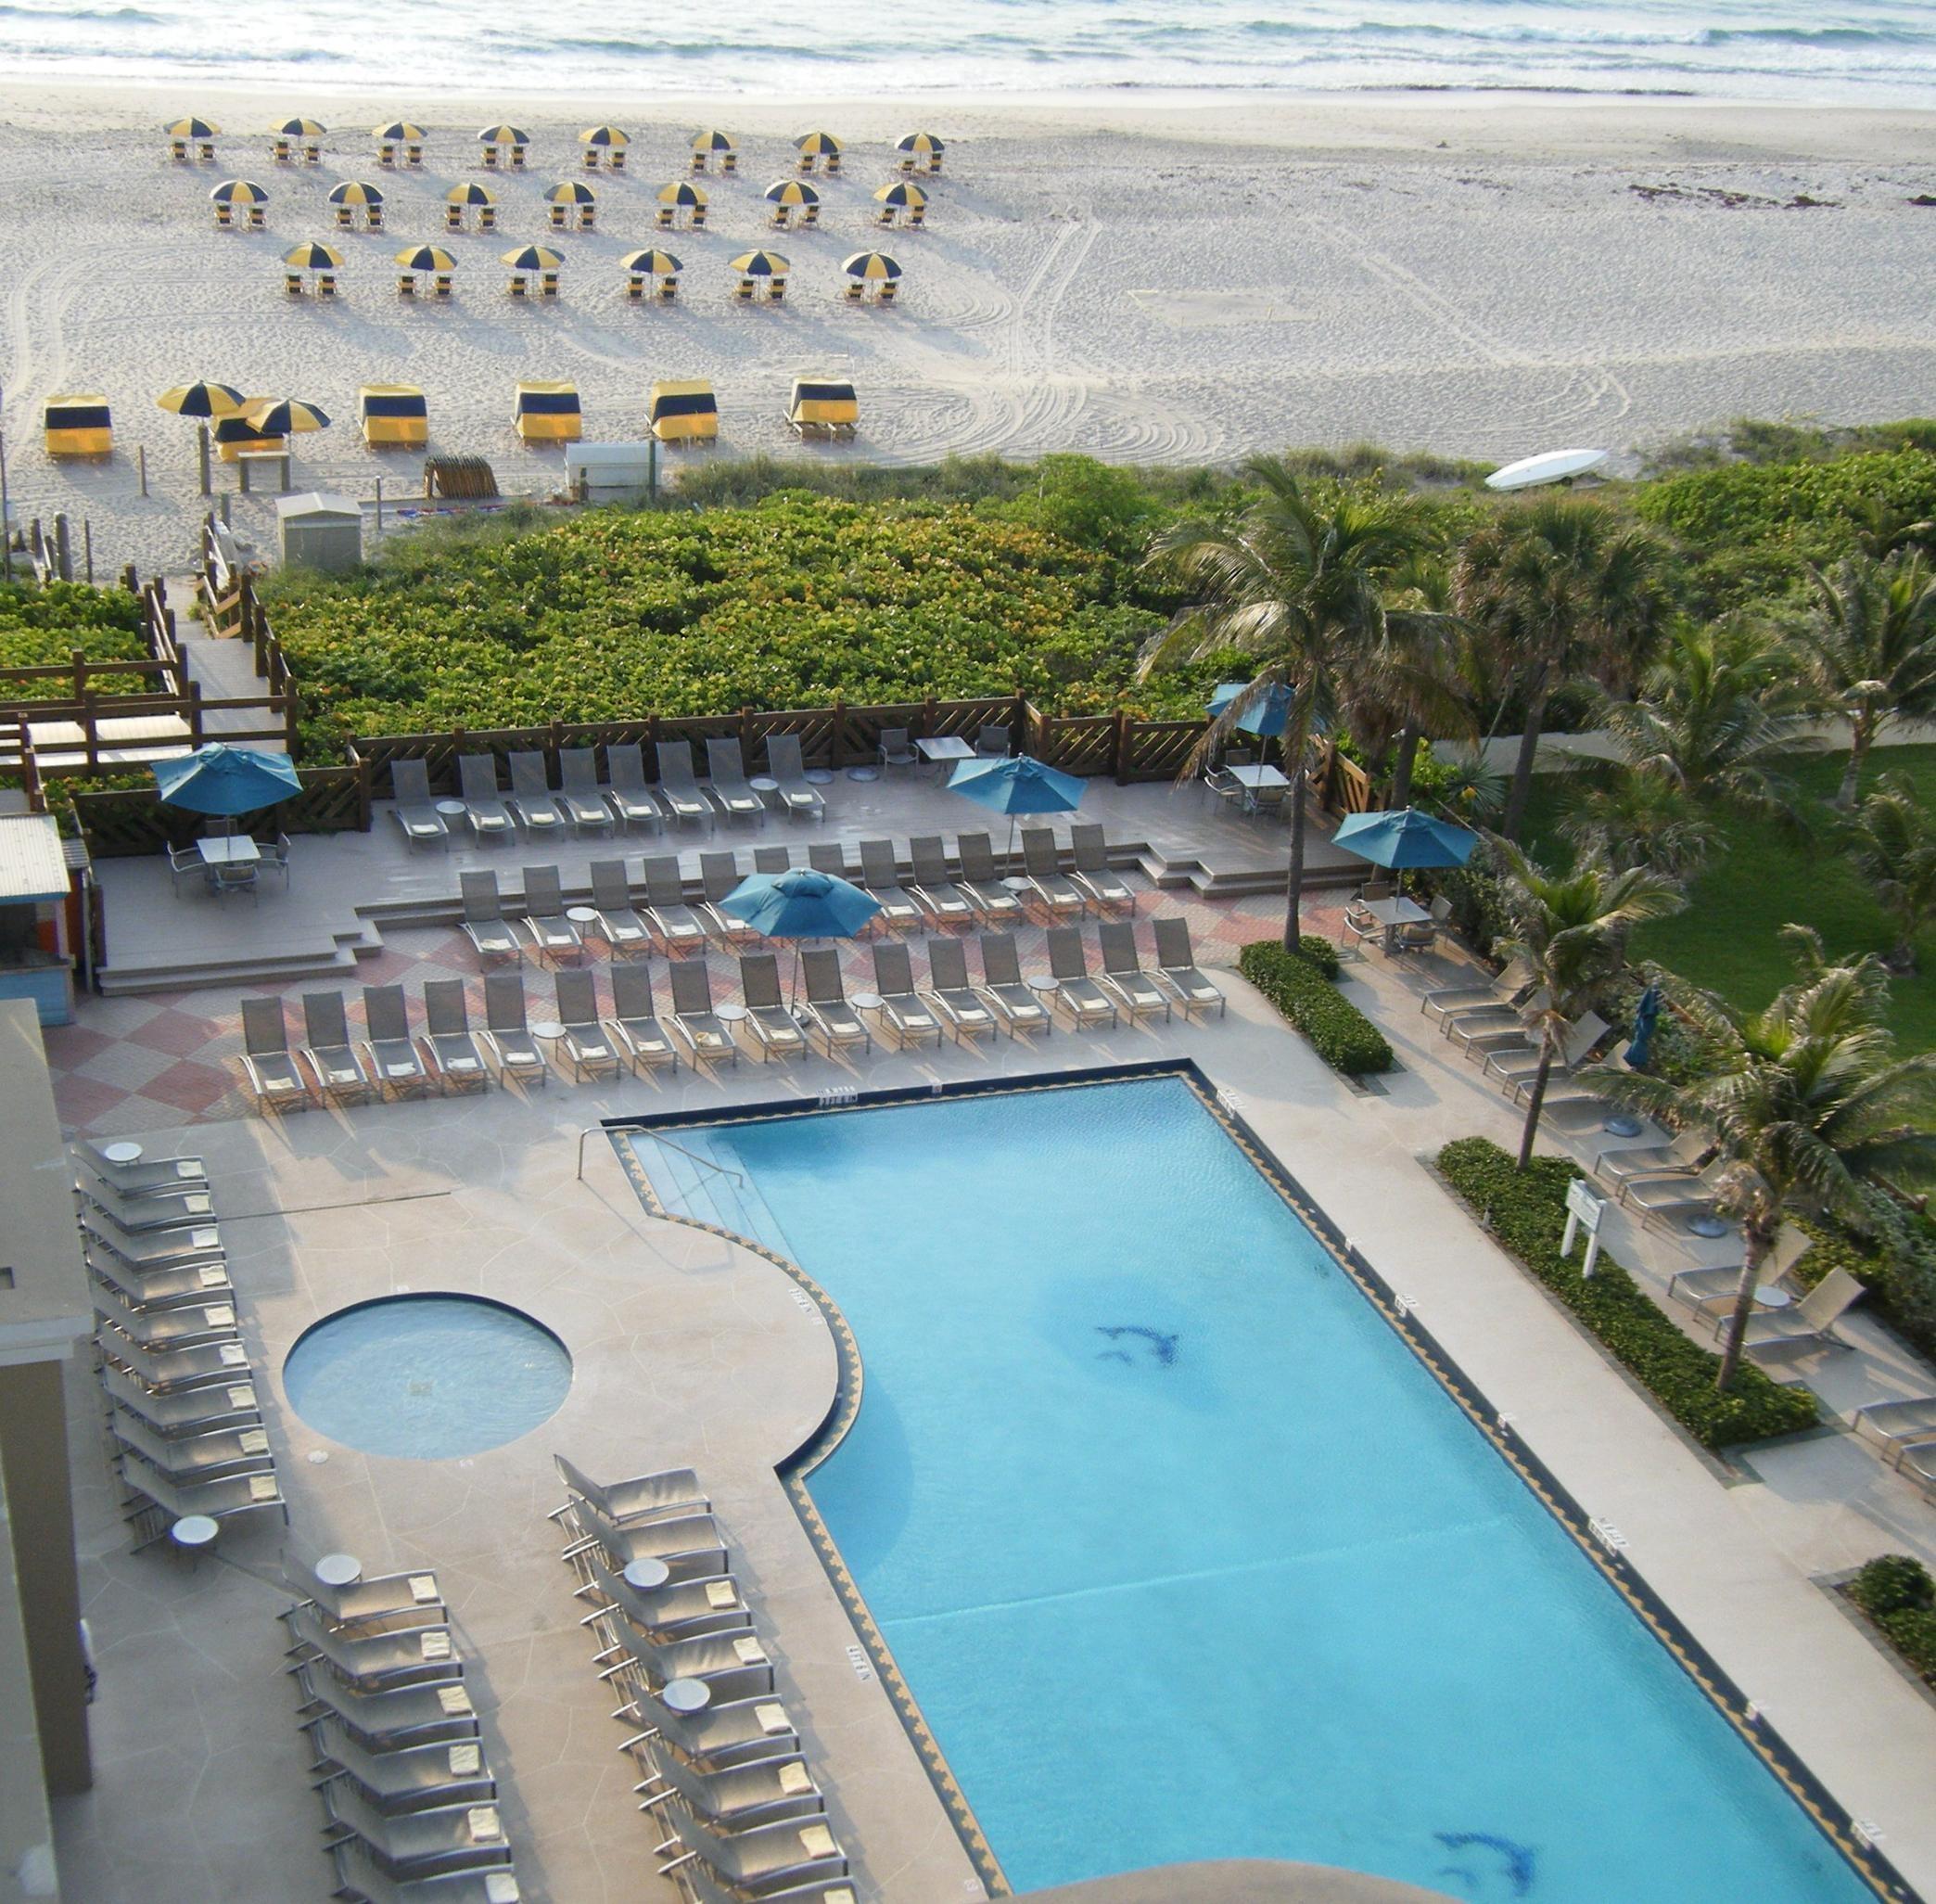 Hilton Singer Island Oceanfront/Palm Beaches Resort image 8